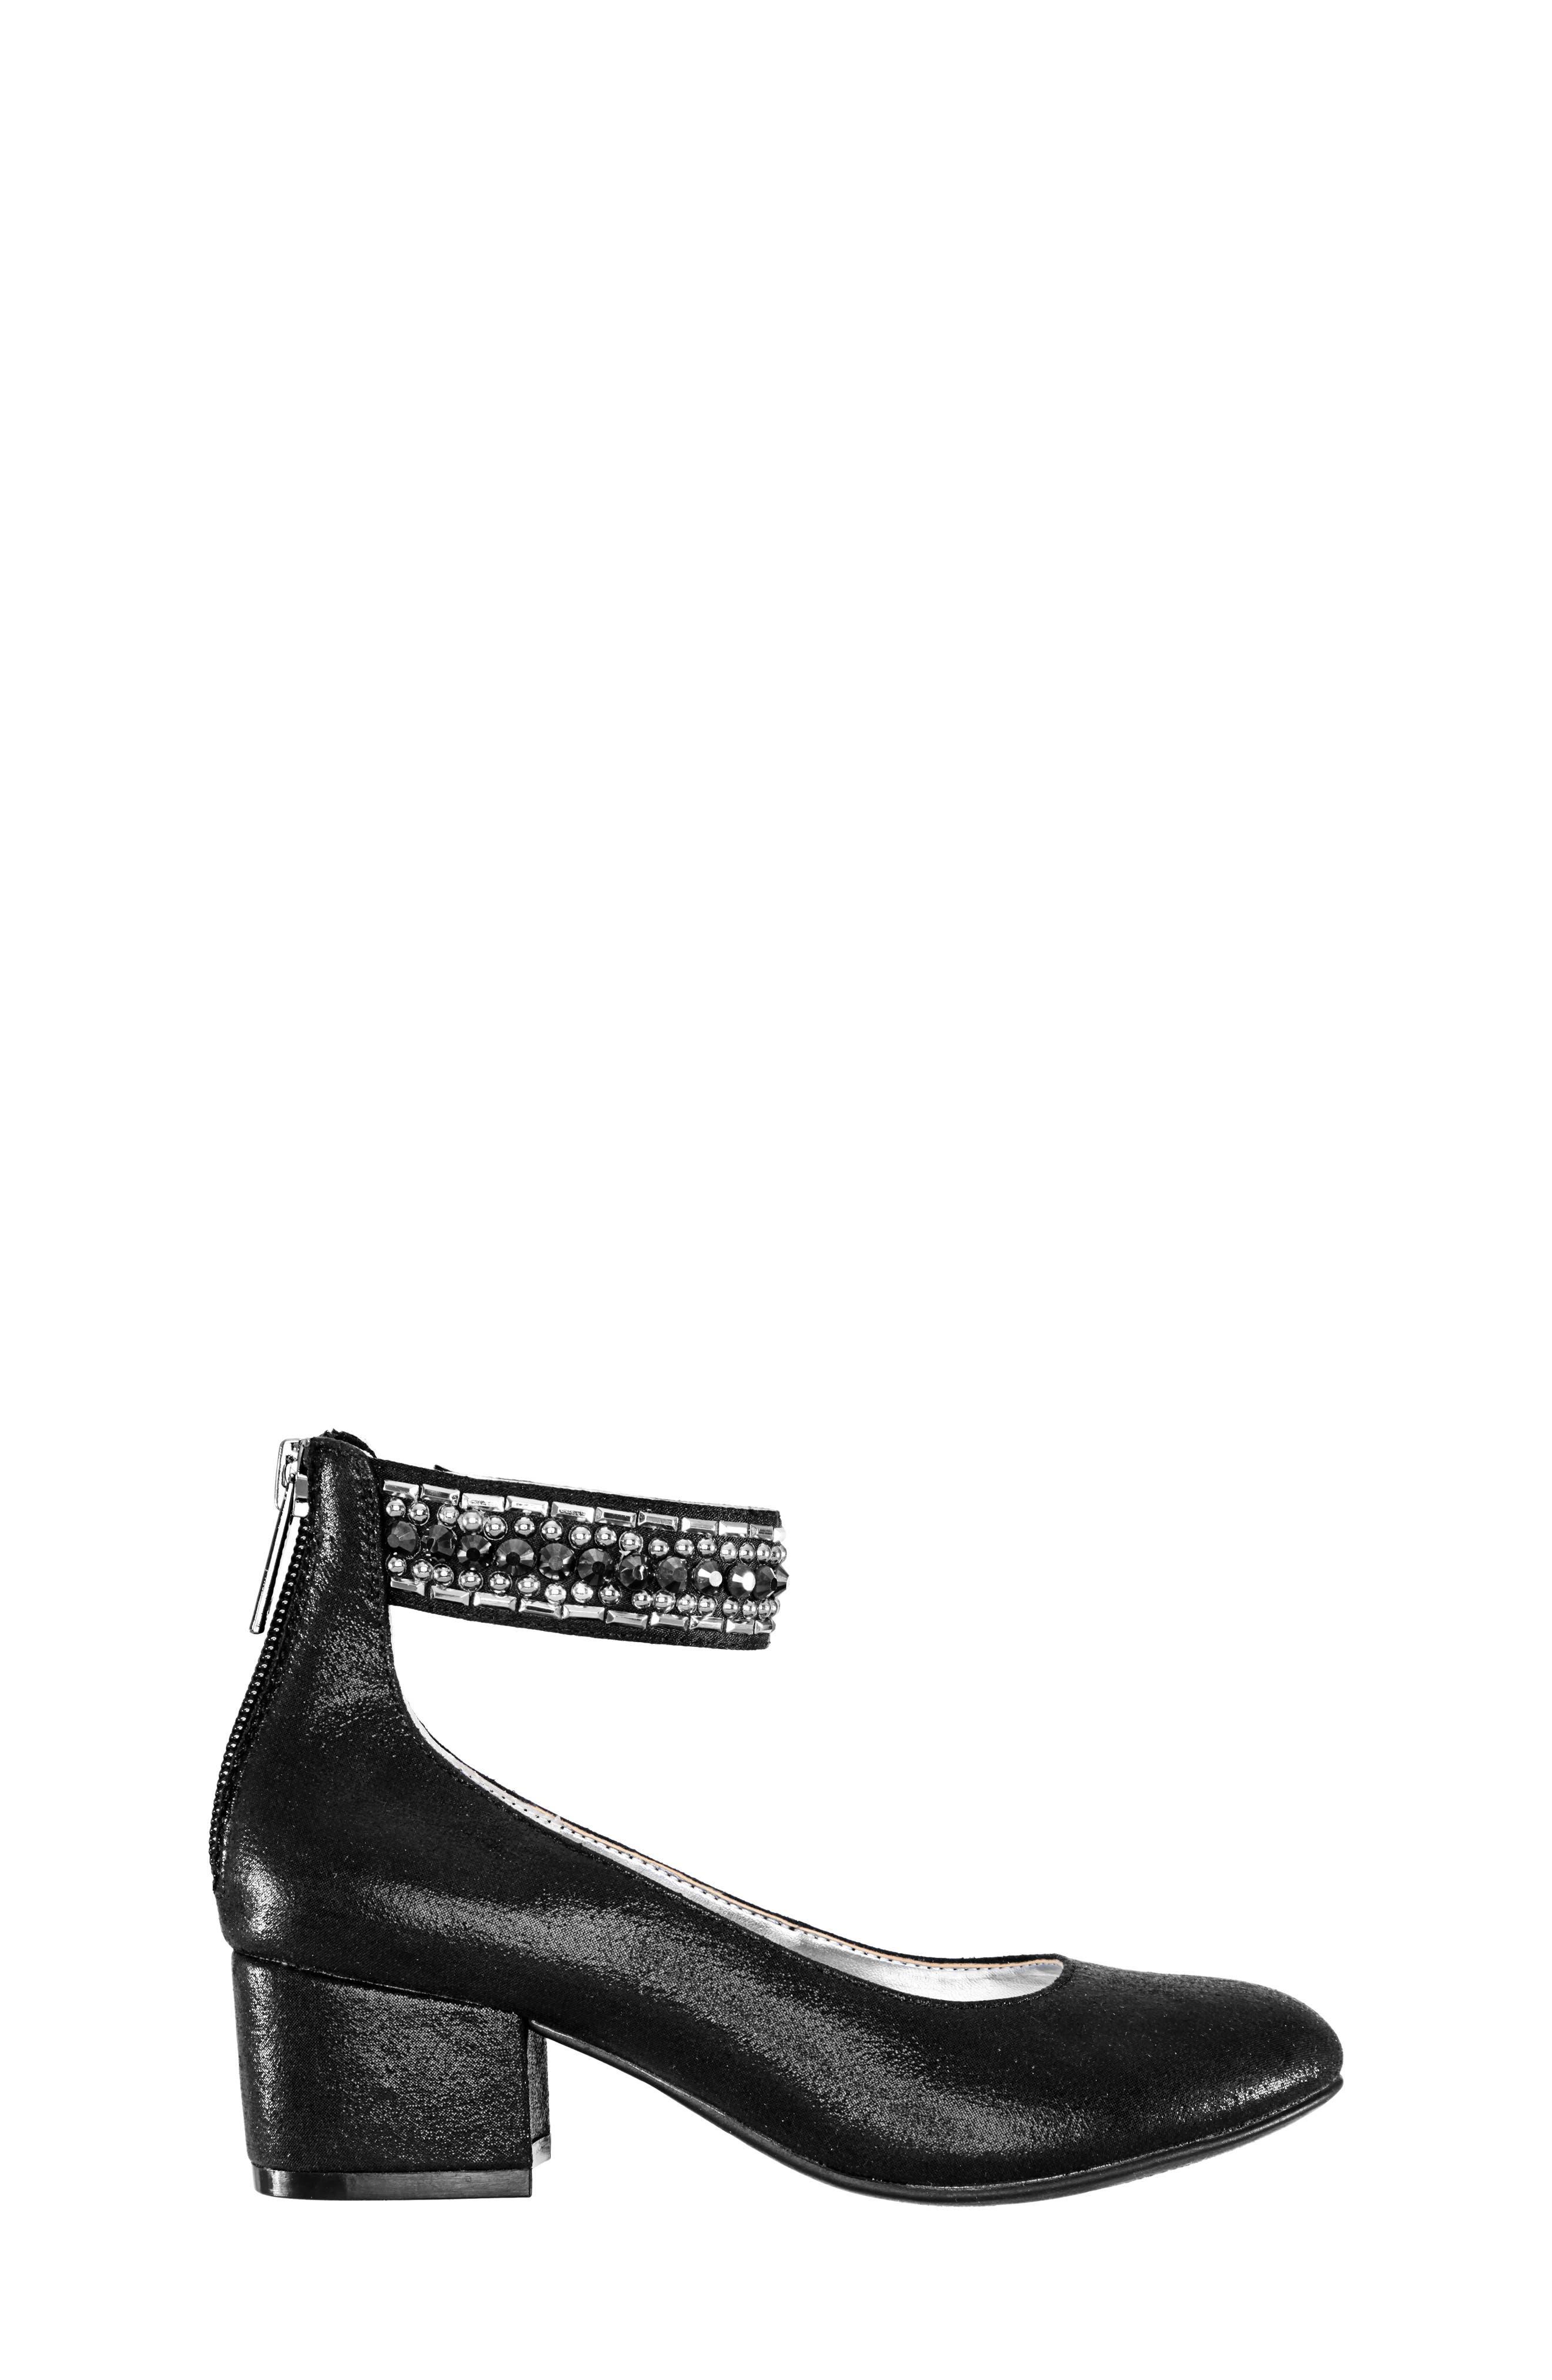 Charleen Ankle Strap Pump,                             Alternate thumbnail 3, color,                             BLACK SHIMMER FABRIC